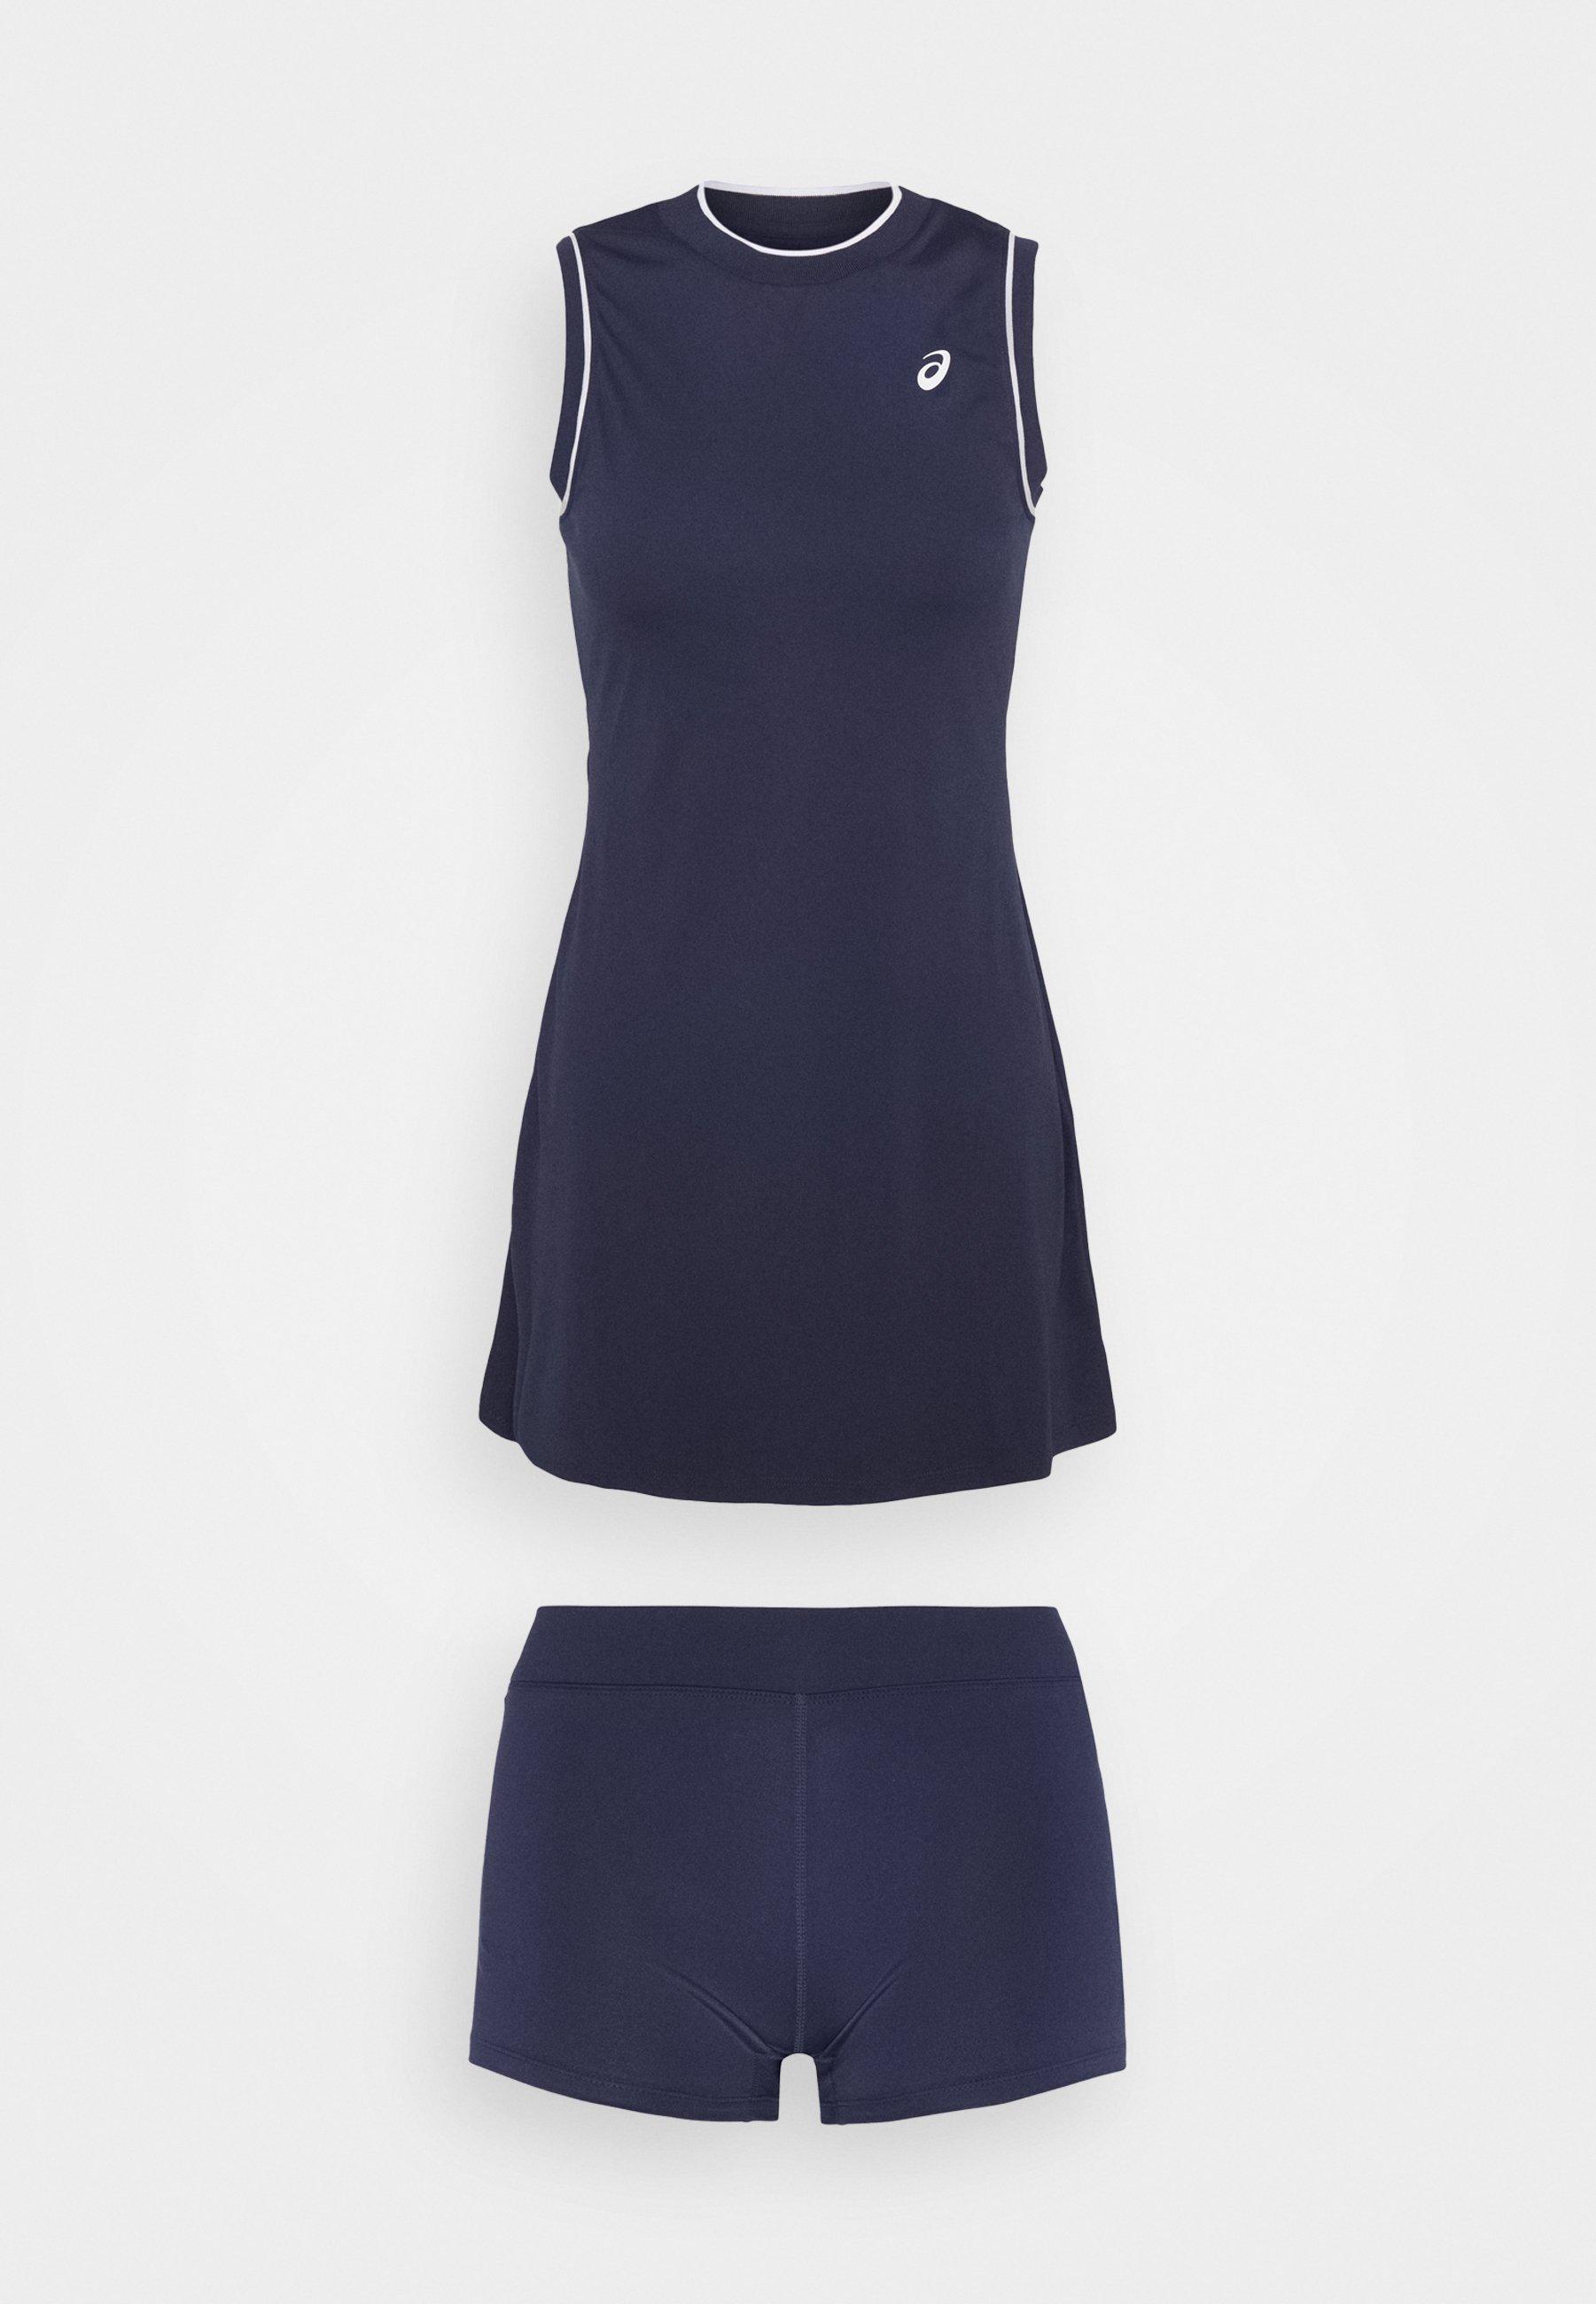 Donna COURT DRESS - Abbigliamento sportivo